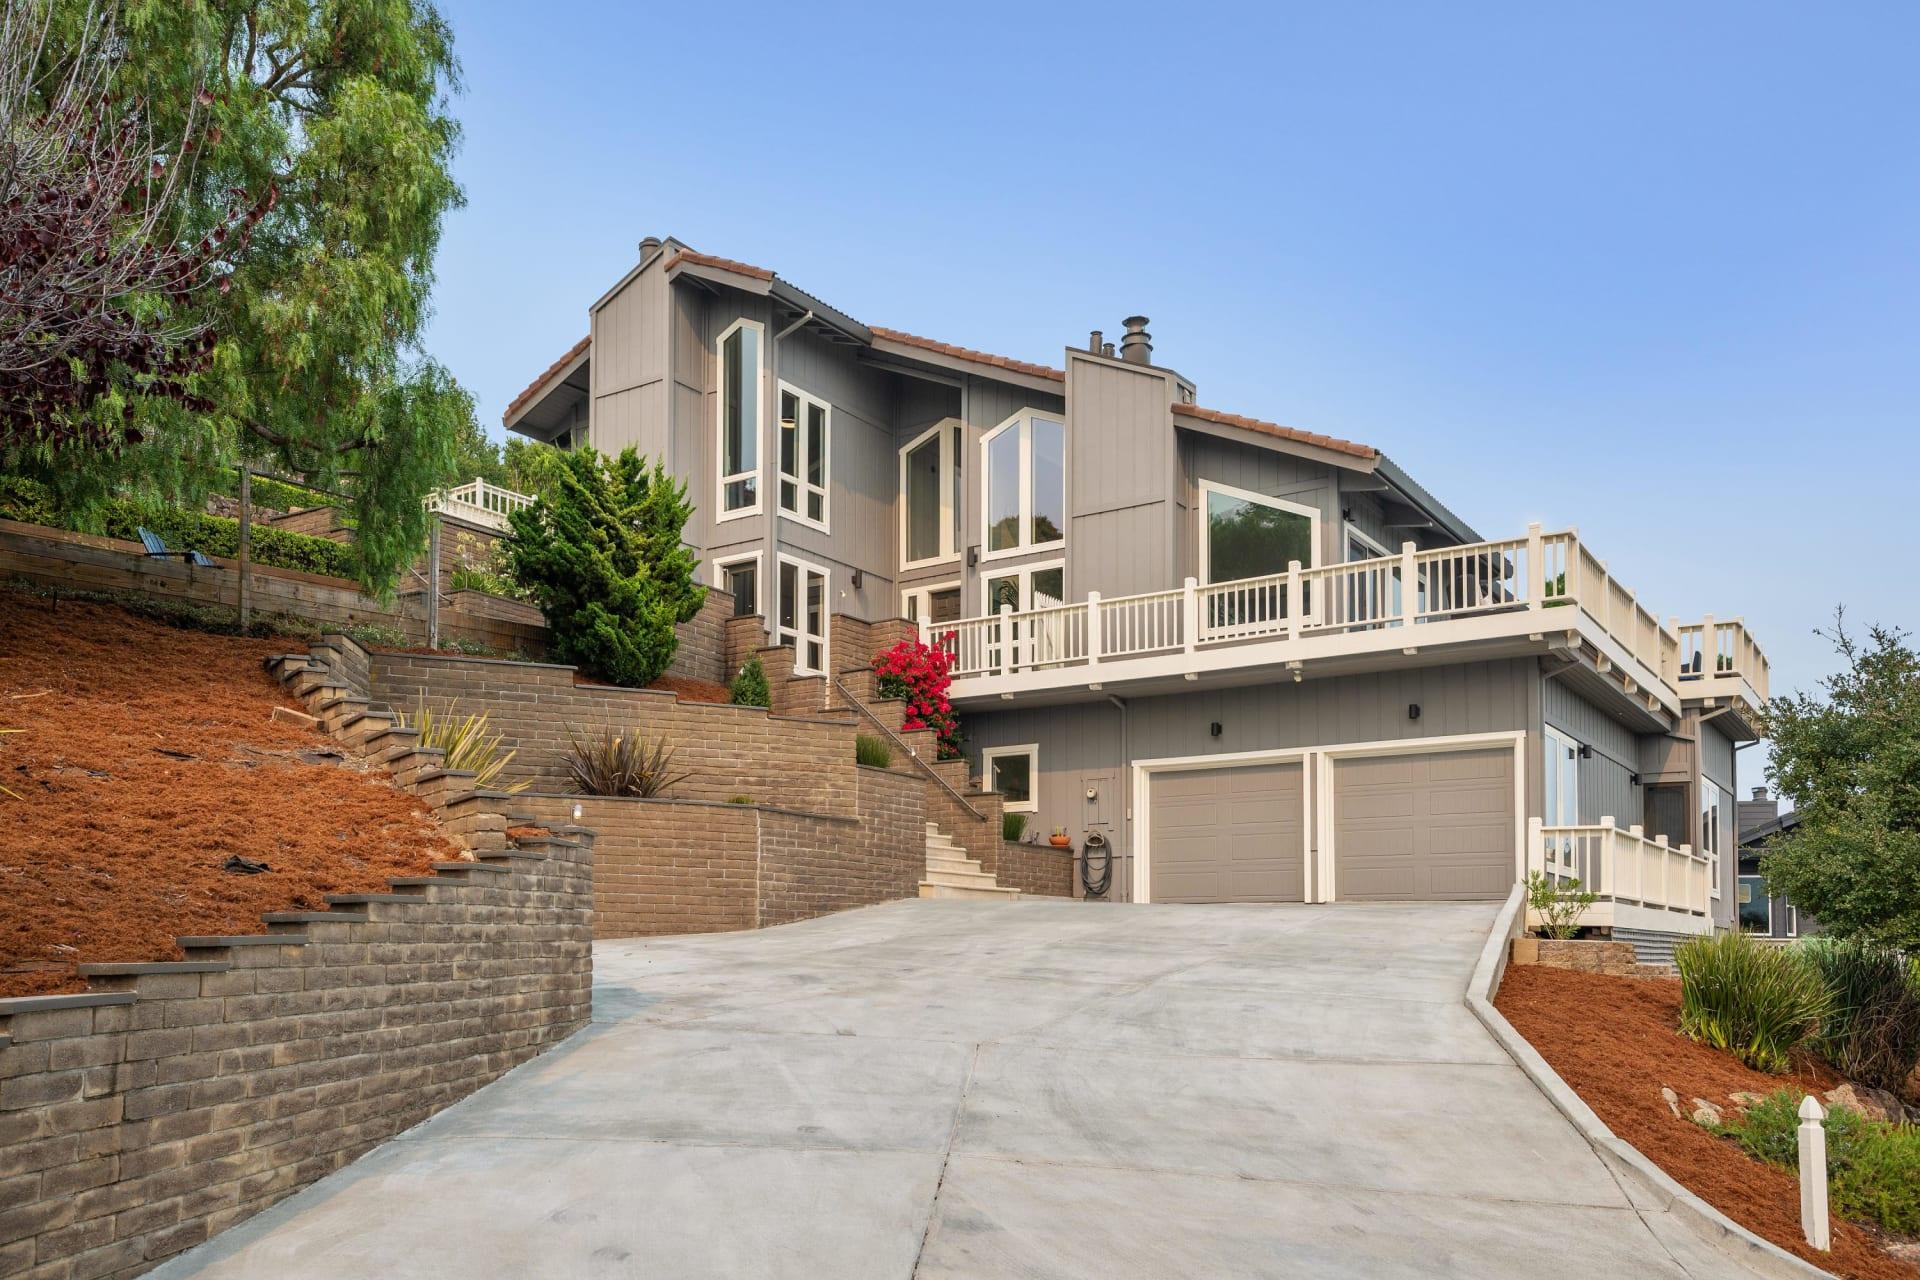 948 W California Ave photo